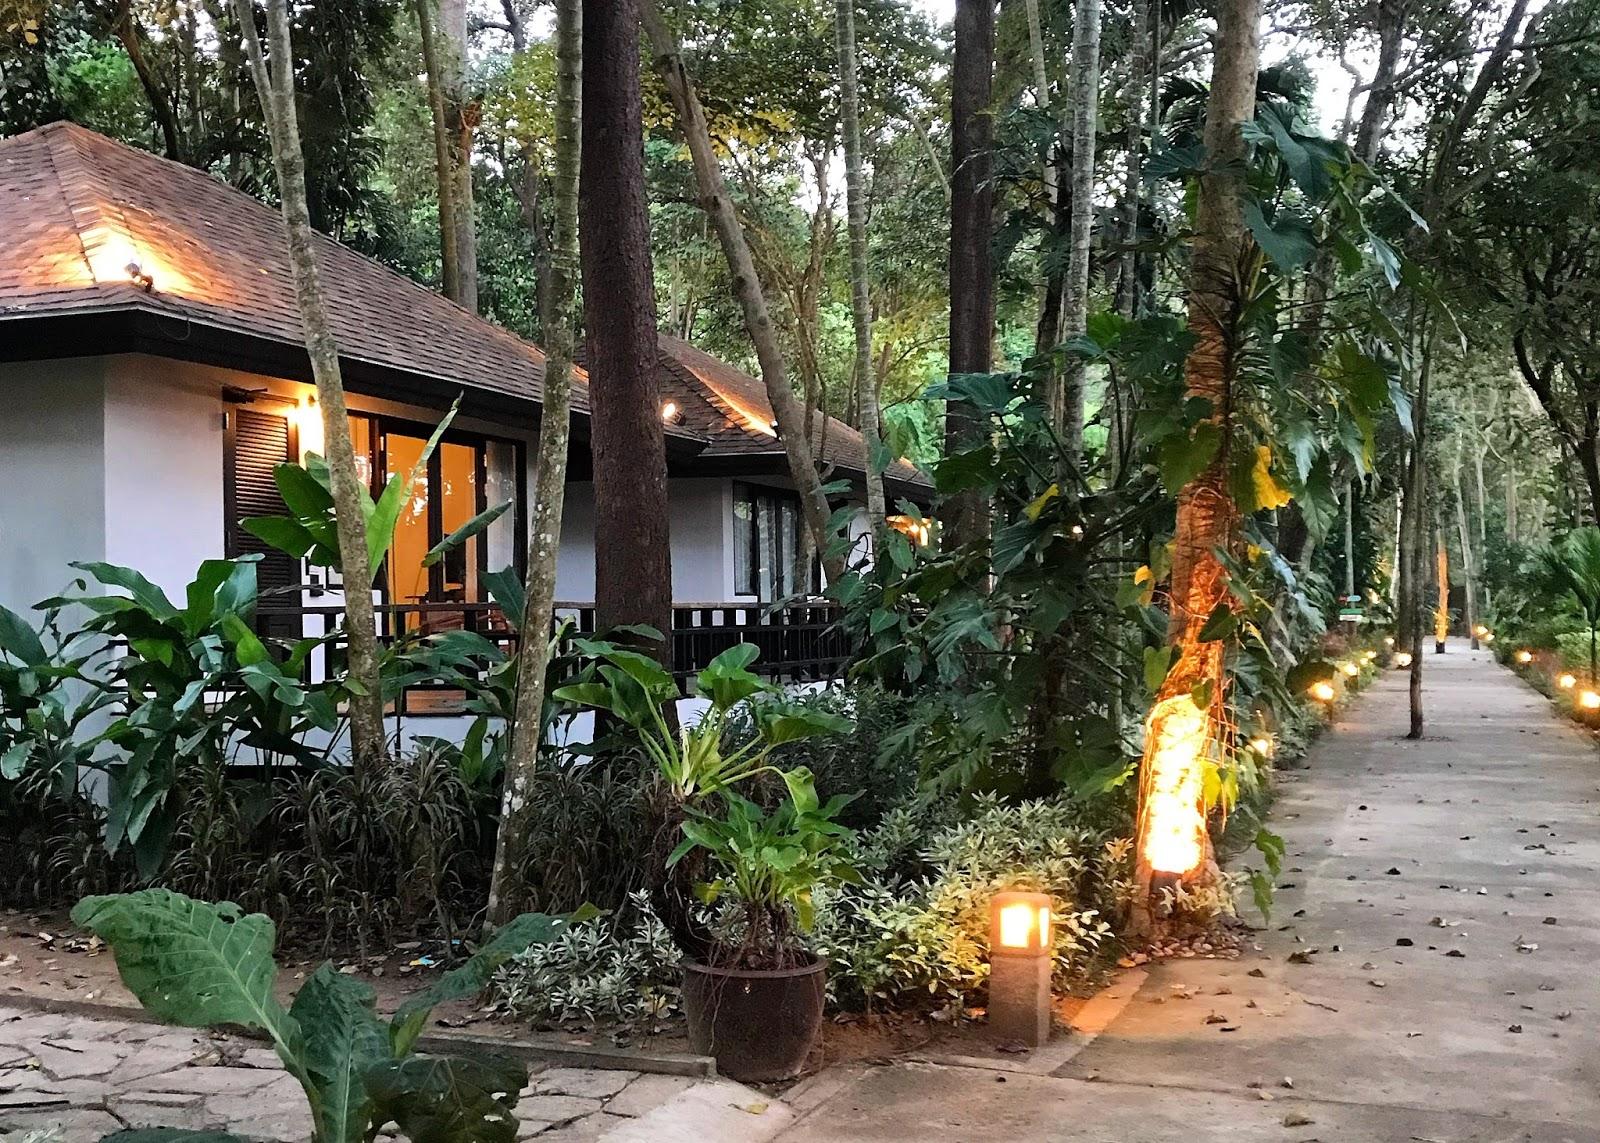 Mooban Talay Resort, wyspa Koh Samet (również Ko Samed)